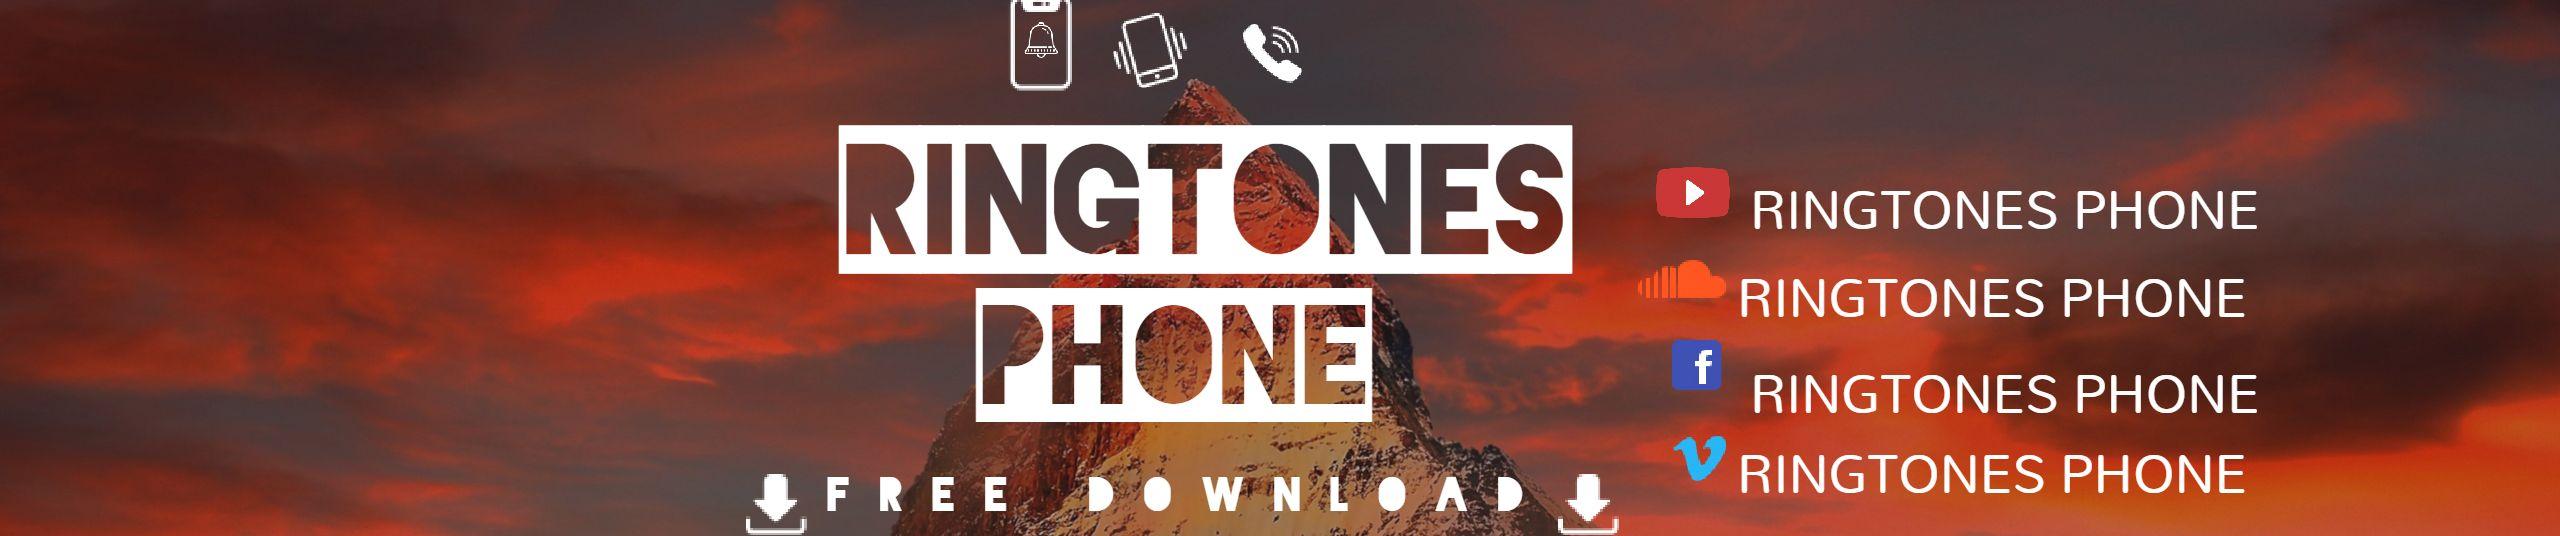 Alan Walker - Darkside Ringtone by Ringtones Phone ✪ | Free